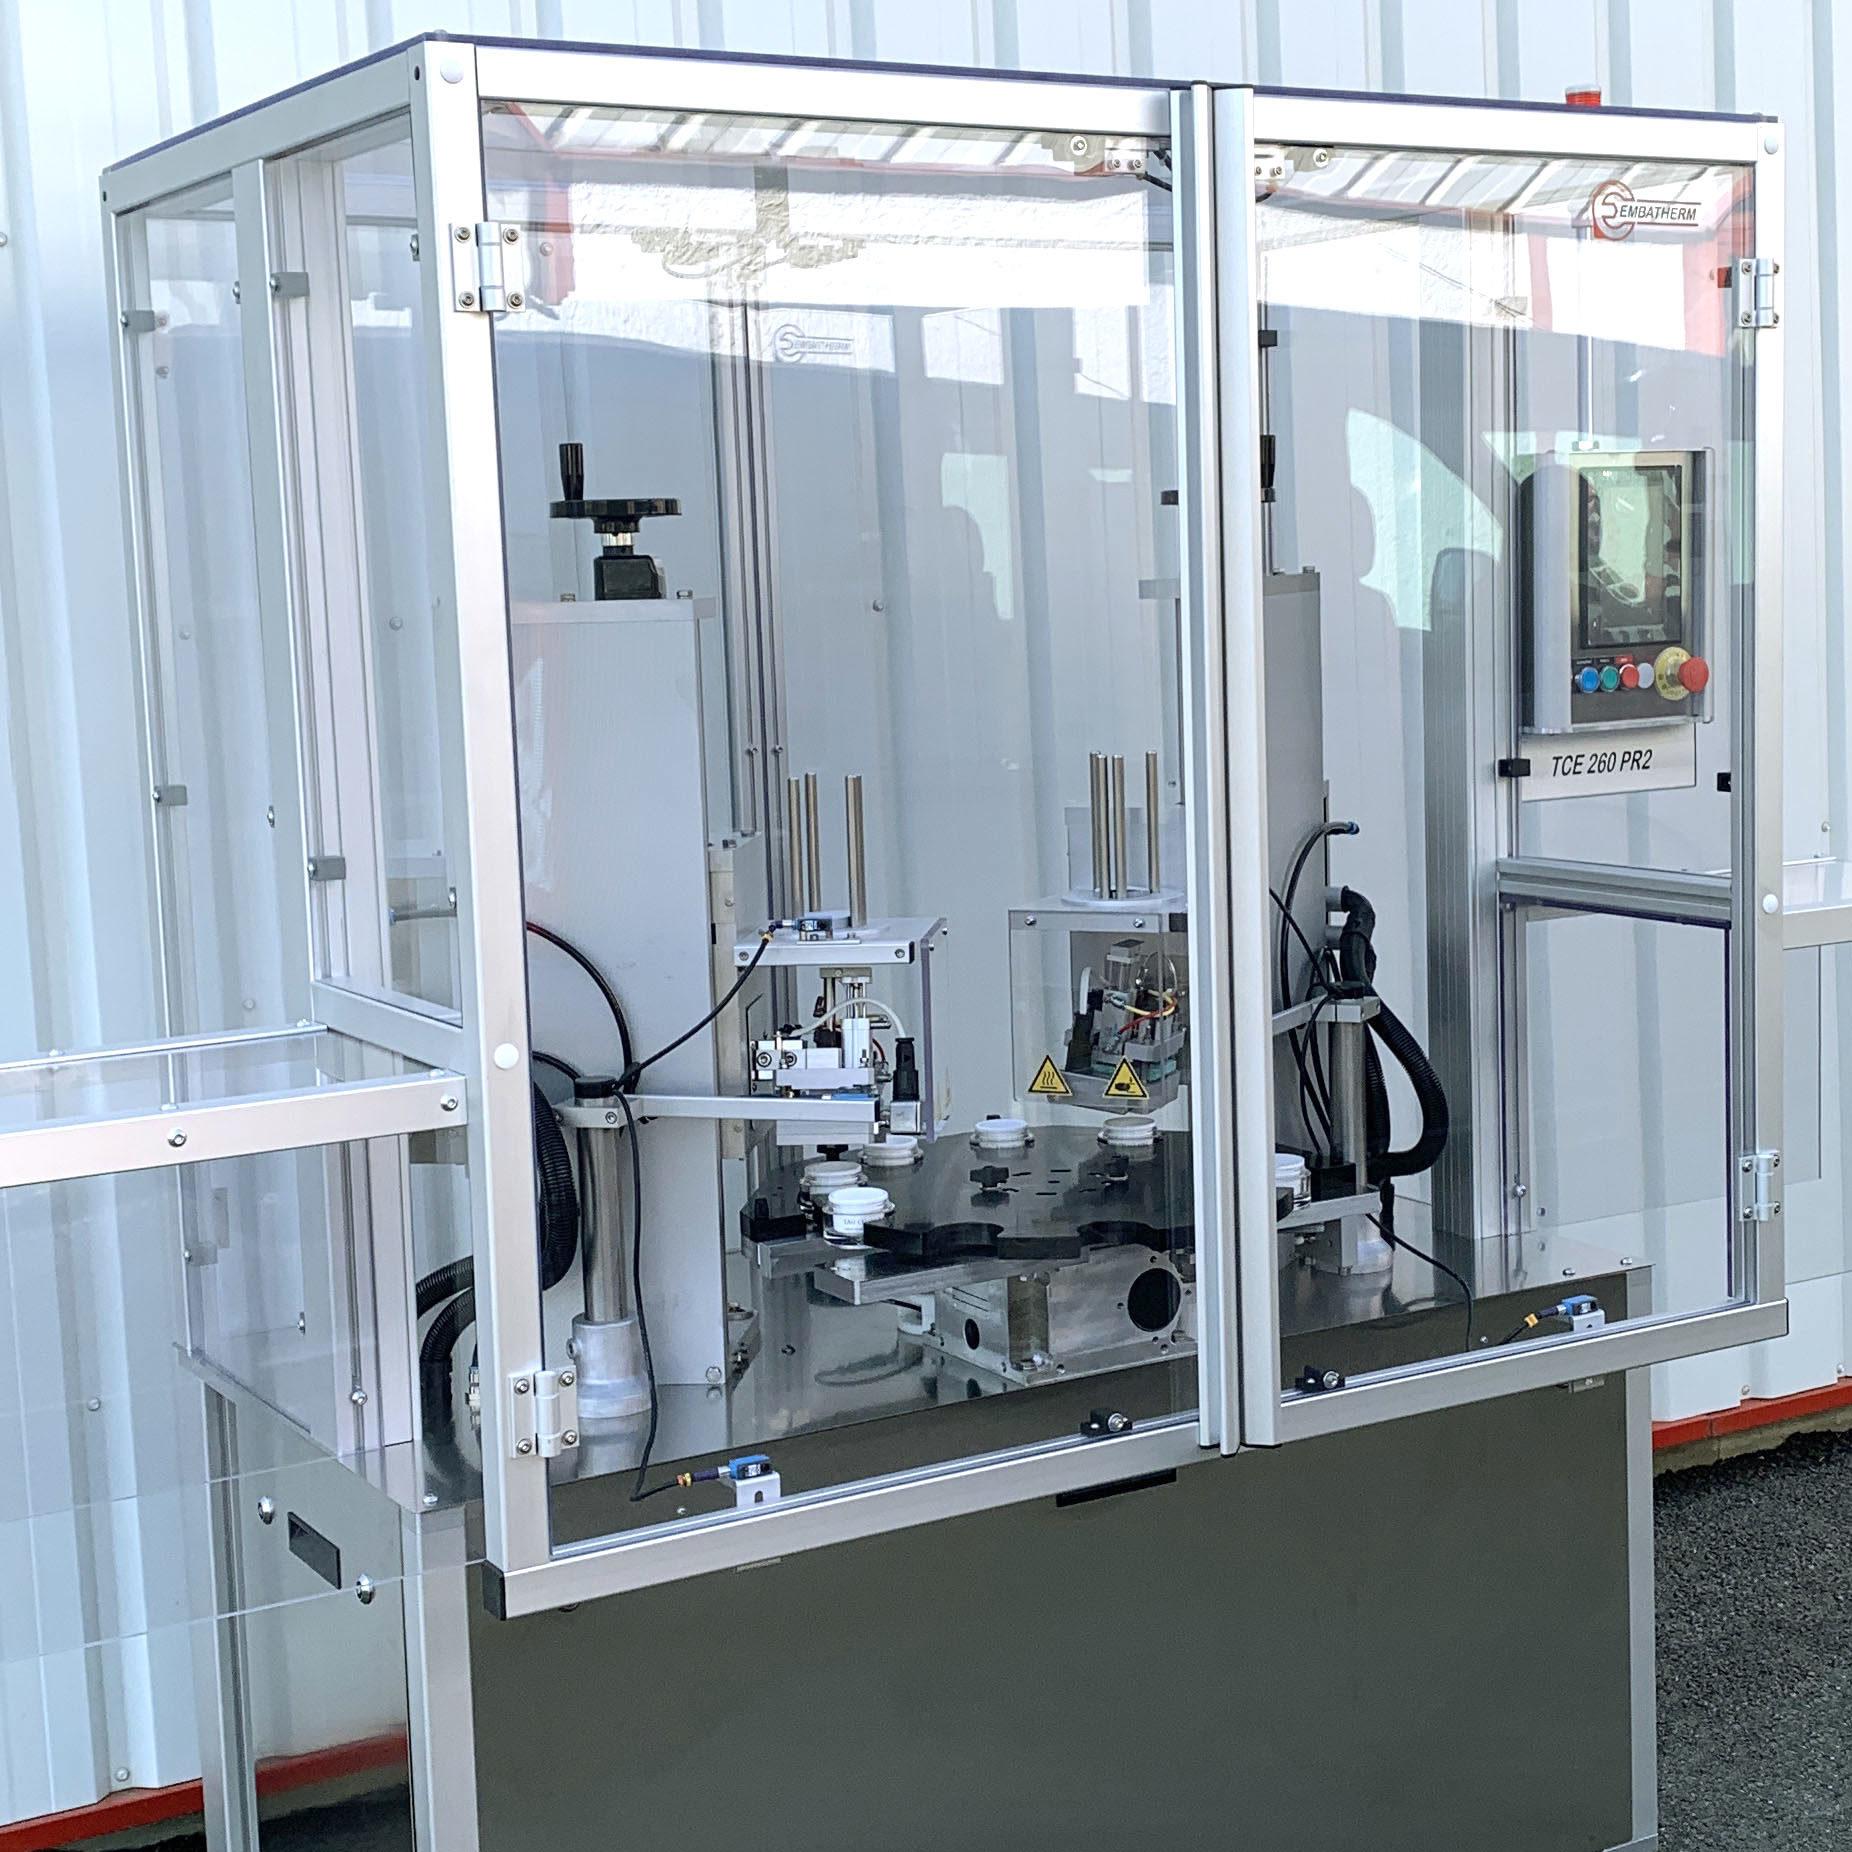 EMBATHERM TCE260PR2 - thermoscelleuse automatique